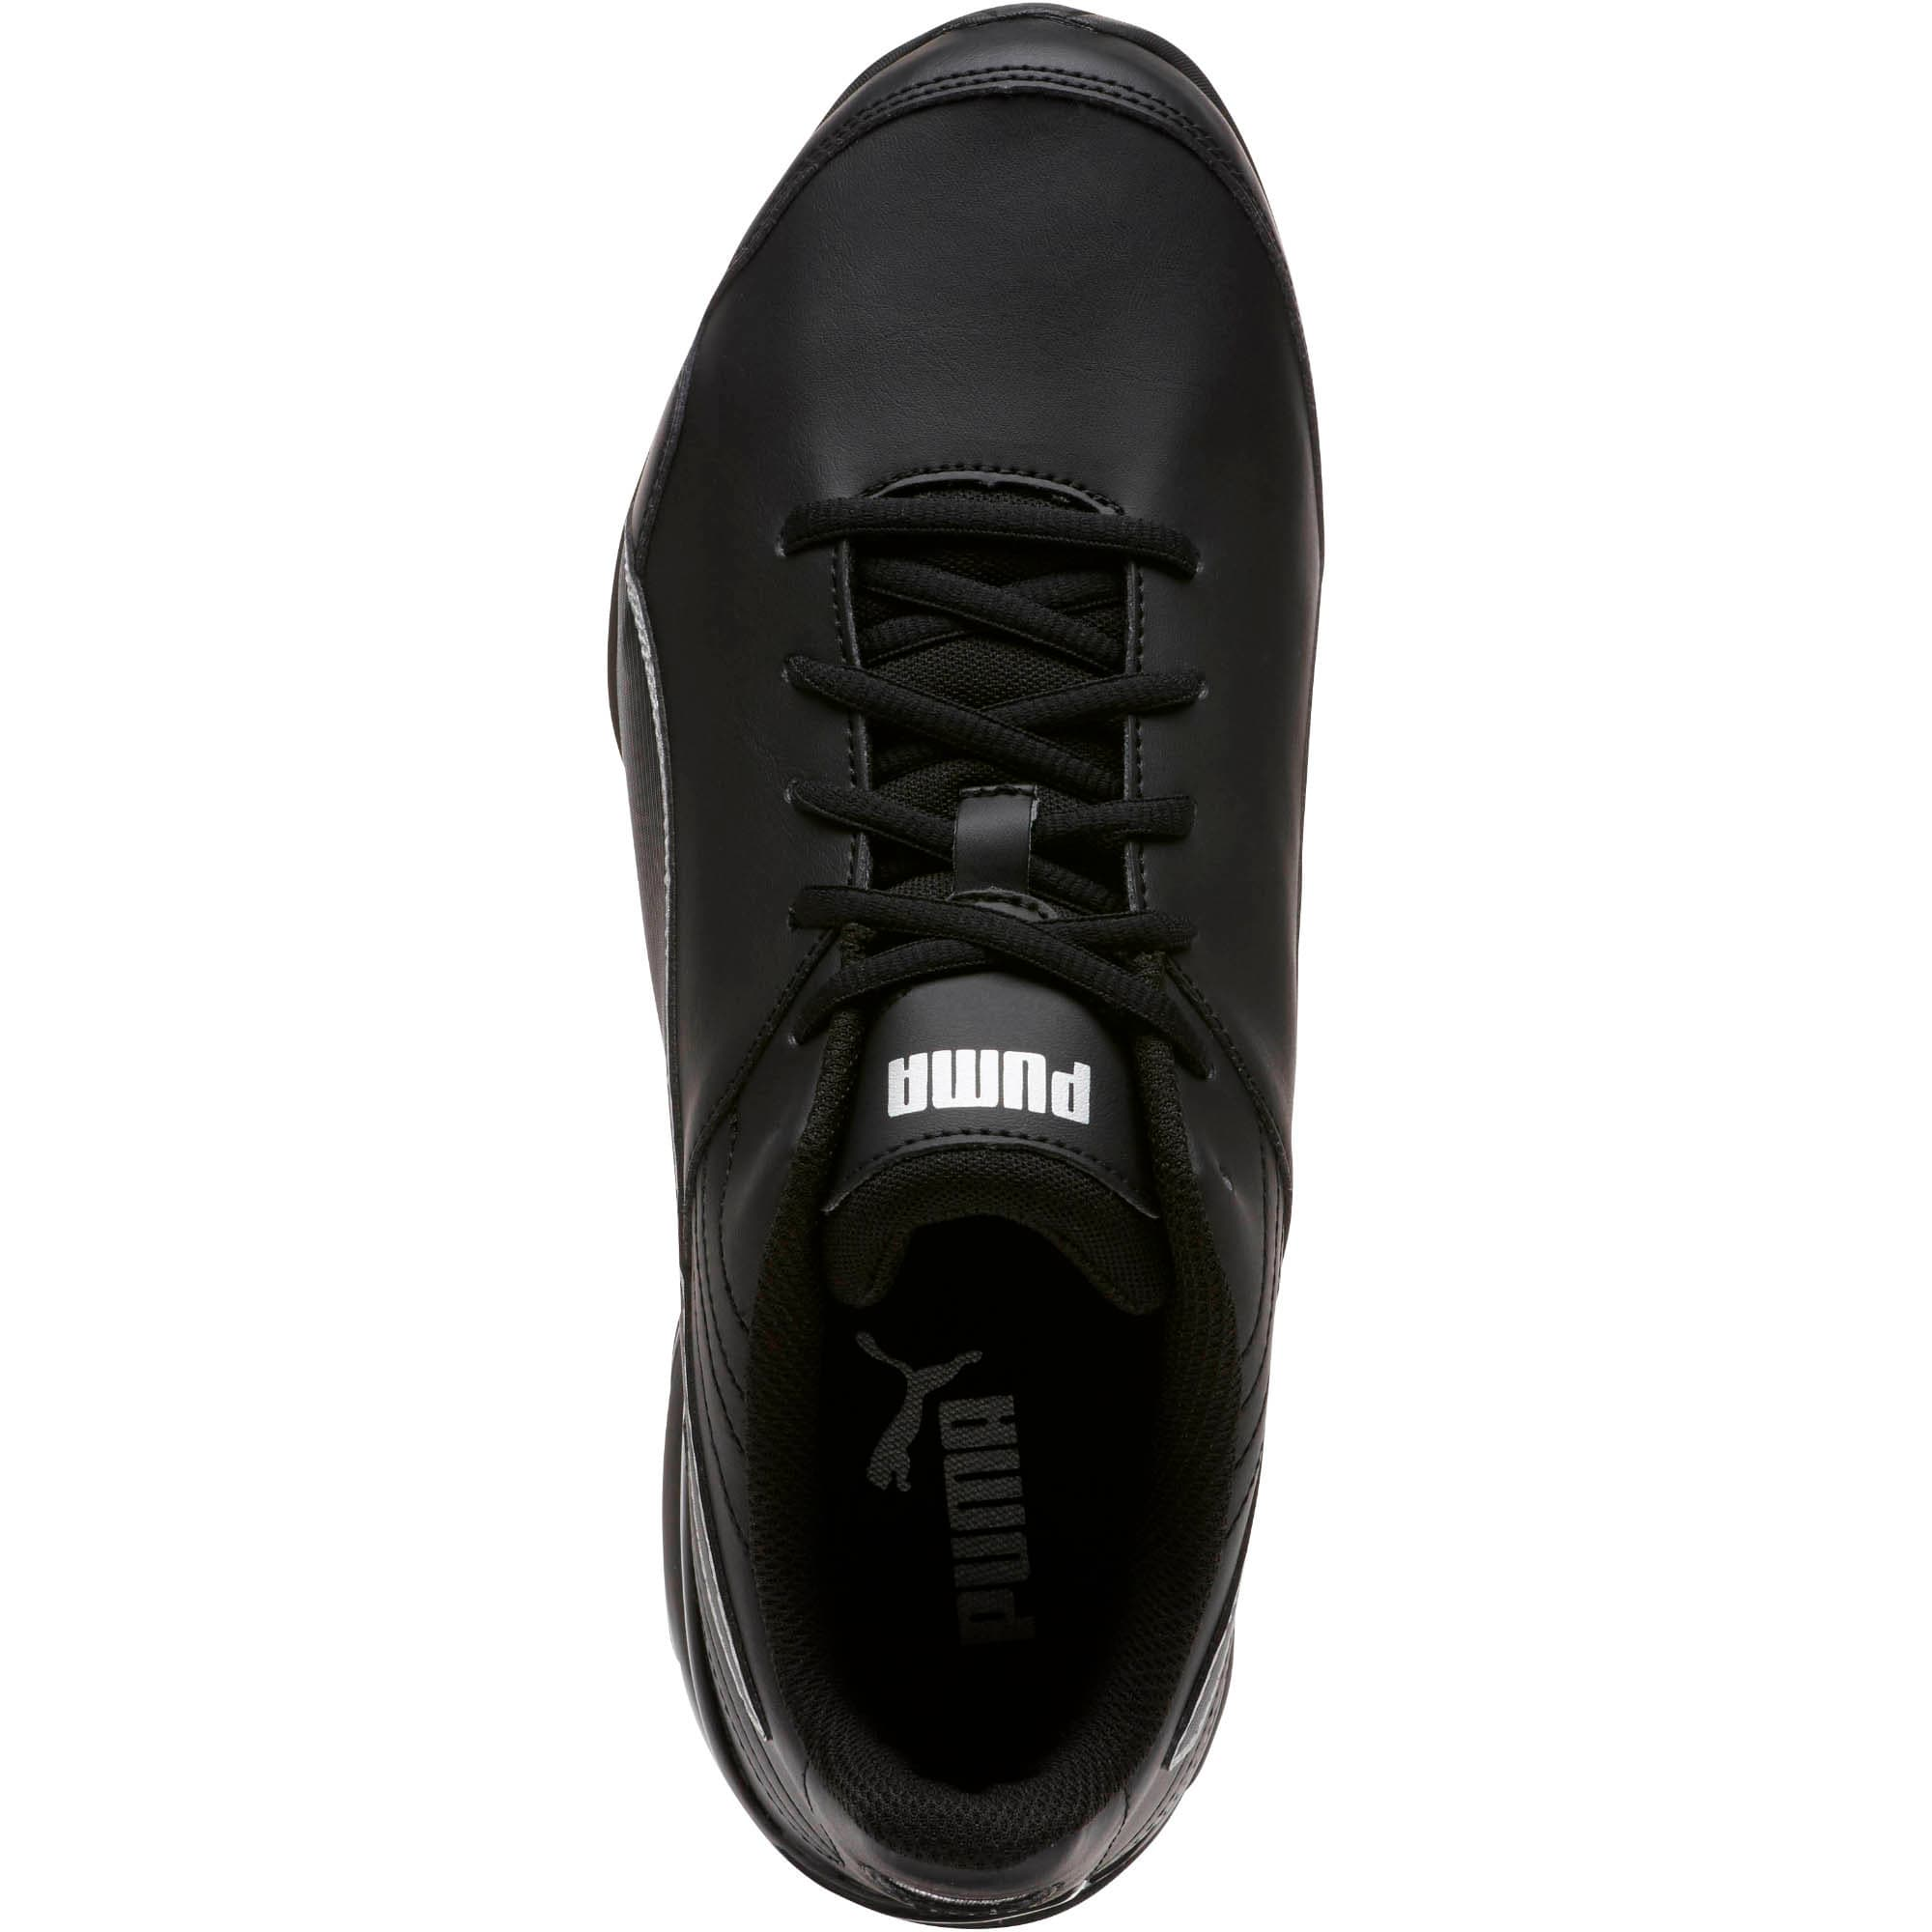 Thumbnail 5 of Super Levitate Men's Running Shoes, Puma Black-Puma Aged Silver, medium